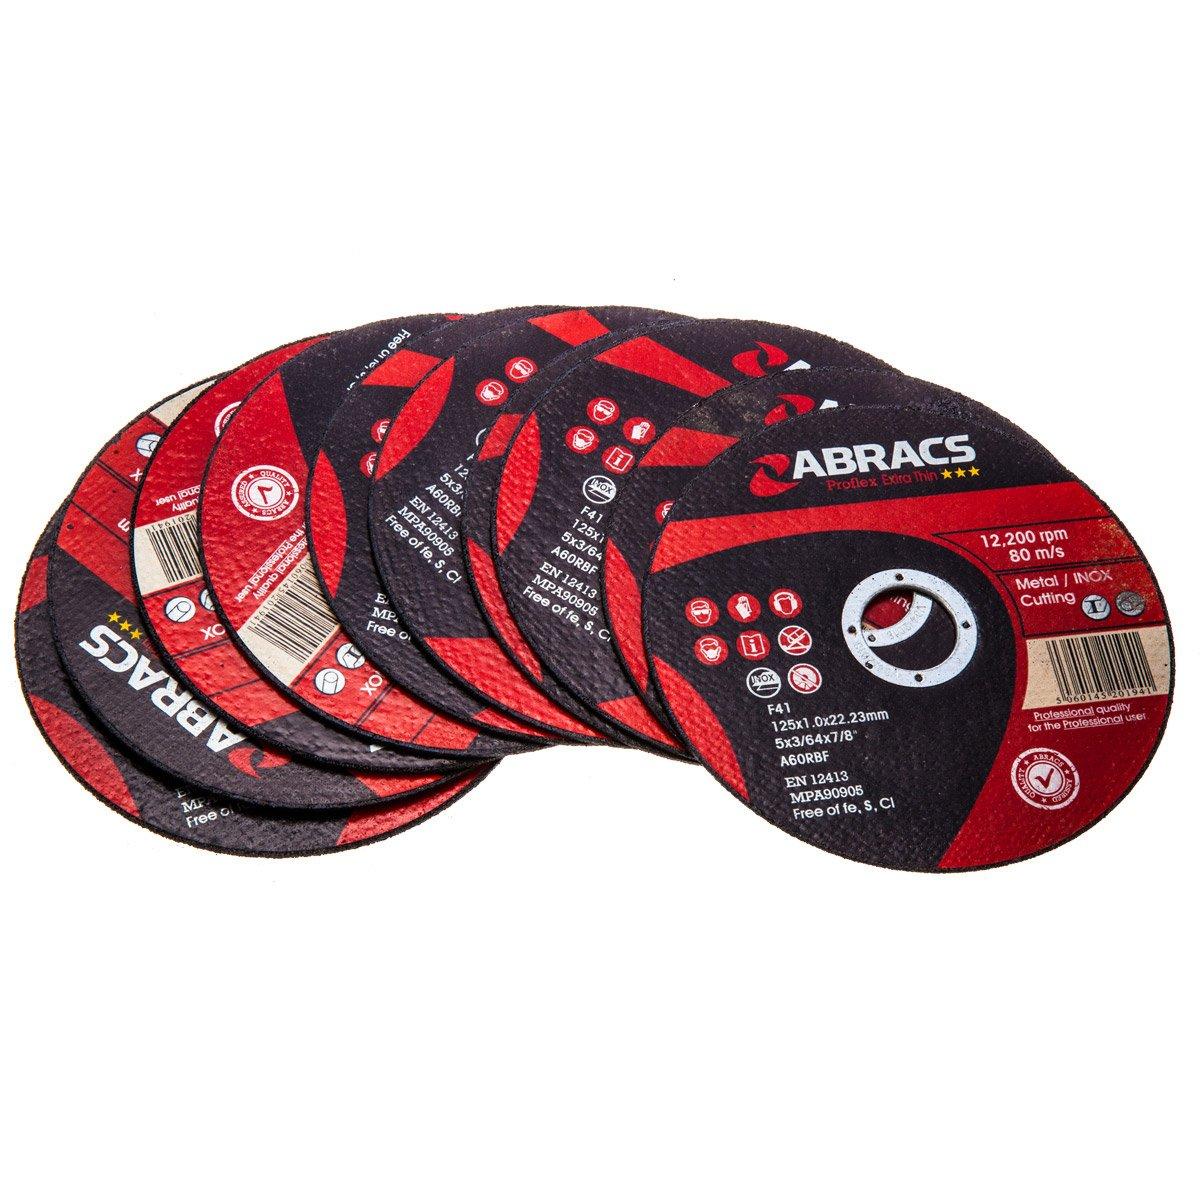 Abracs PFET12510FI 125 x 1.0 x 22 mm Extra Thin INOX Cutting Disc - Red (Pack of 10)